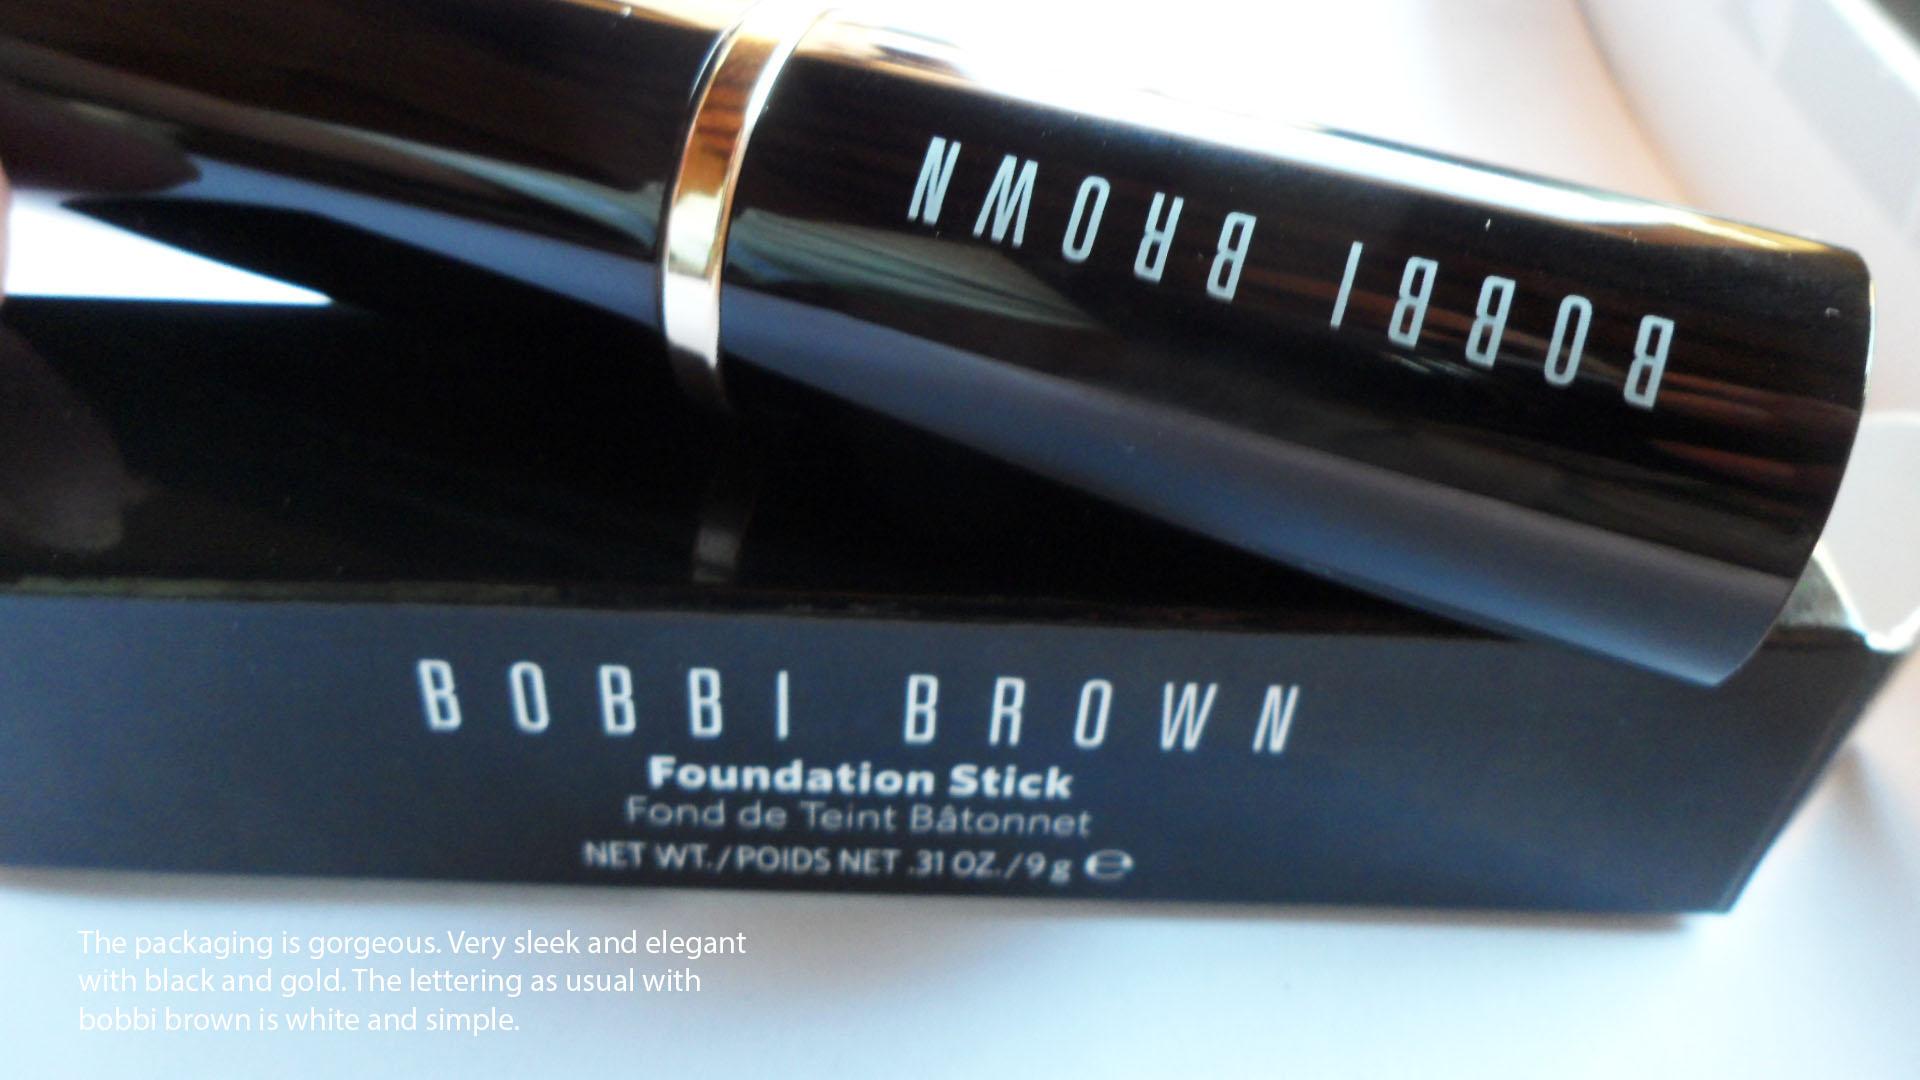 Introducing, the Bobbi Brown new skin foundation stick